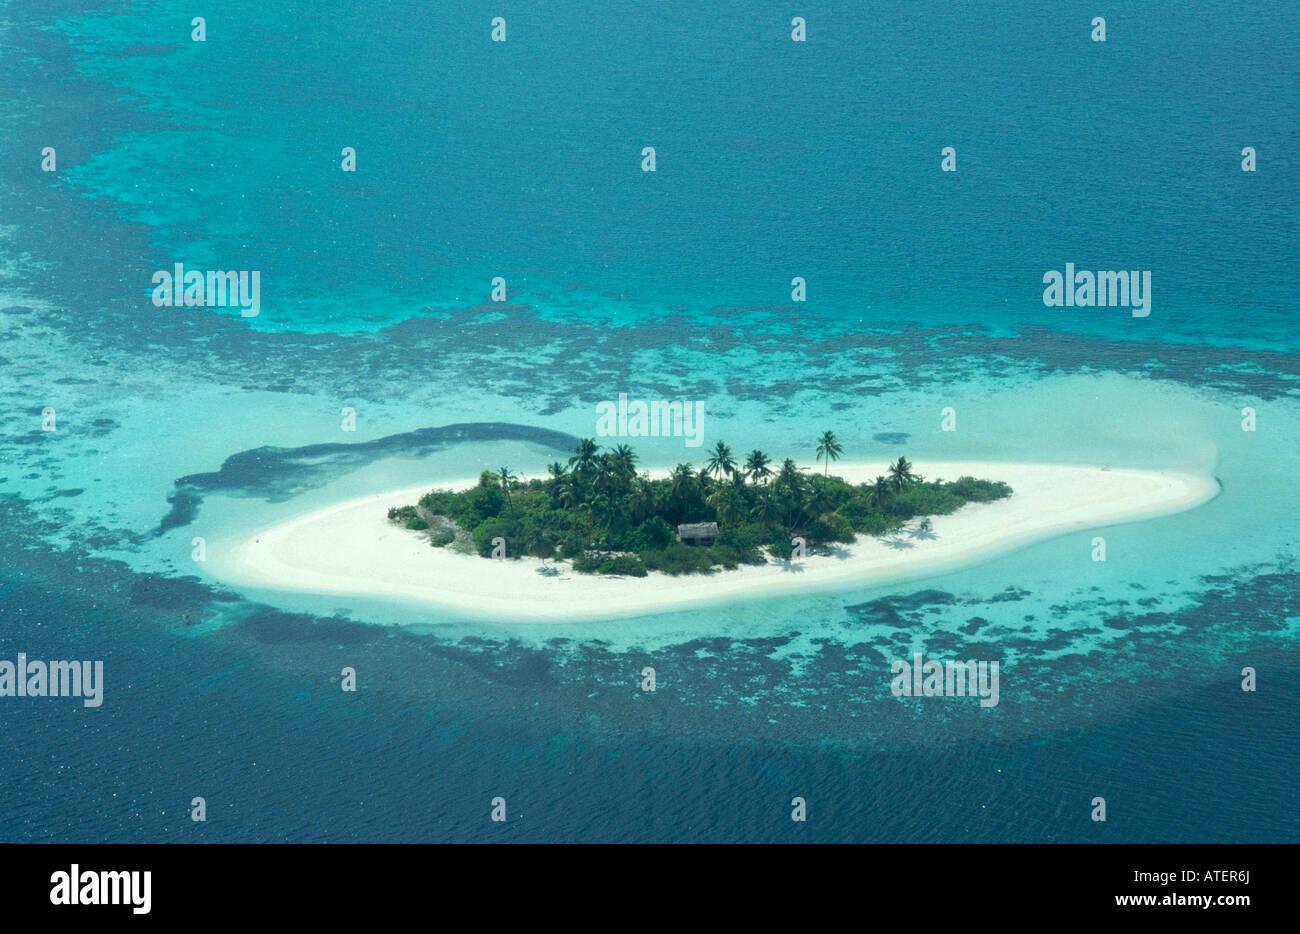 Tropical Island / Tropische Insel - Stock Image